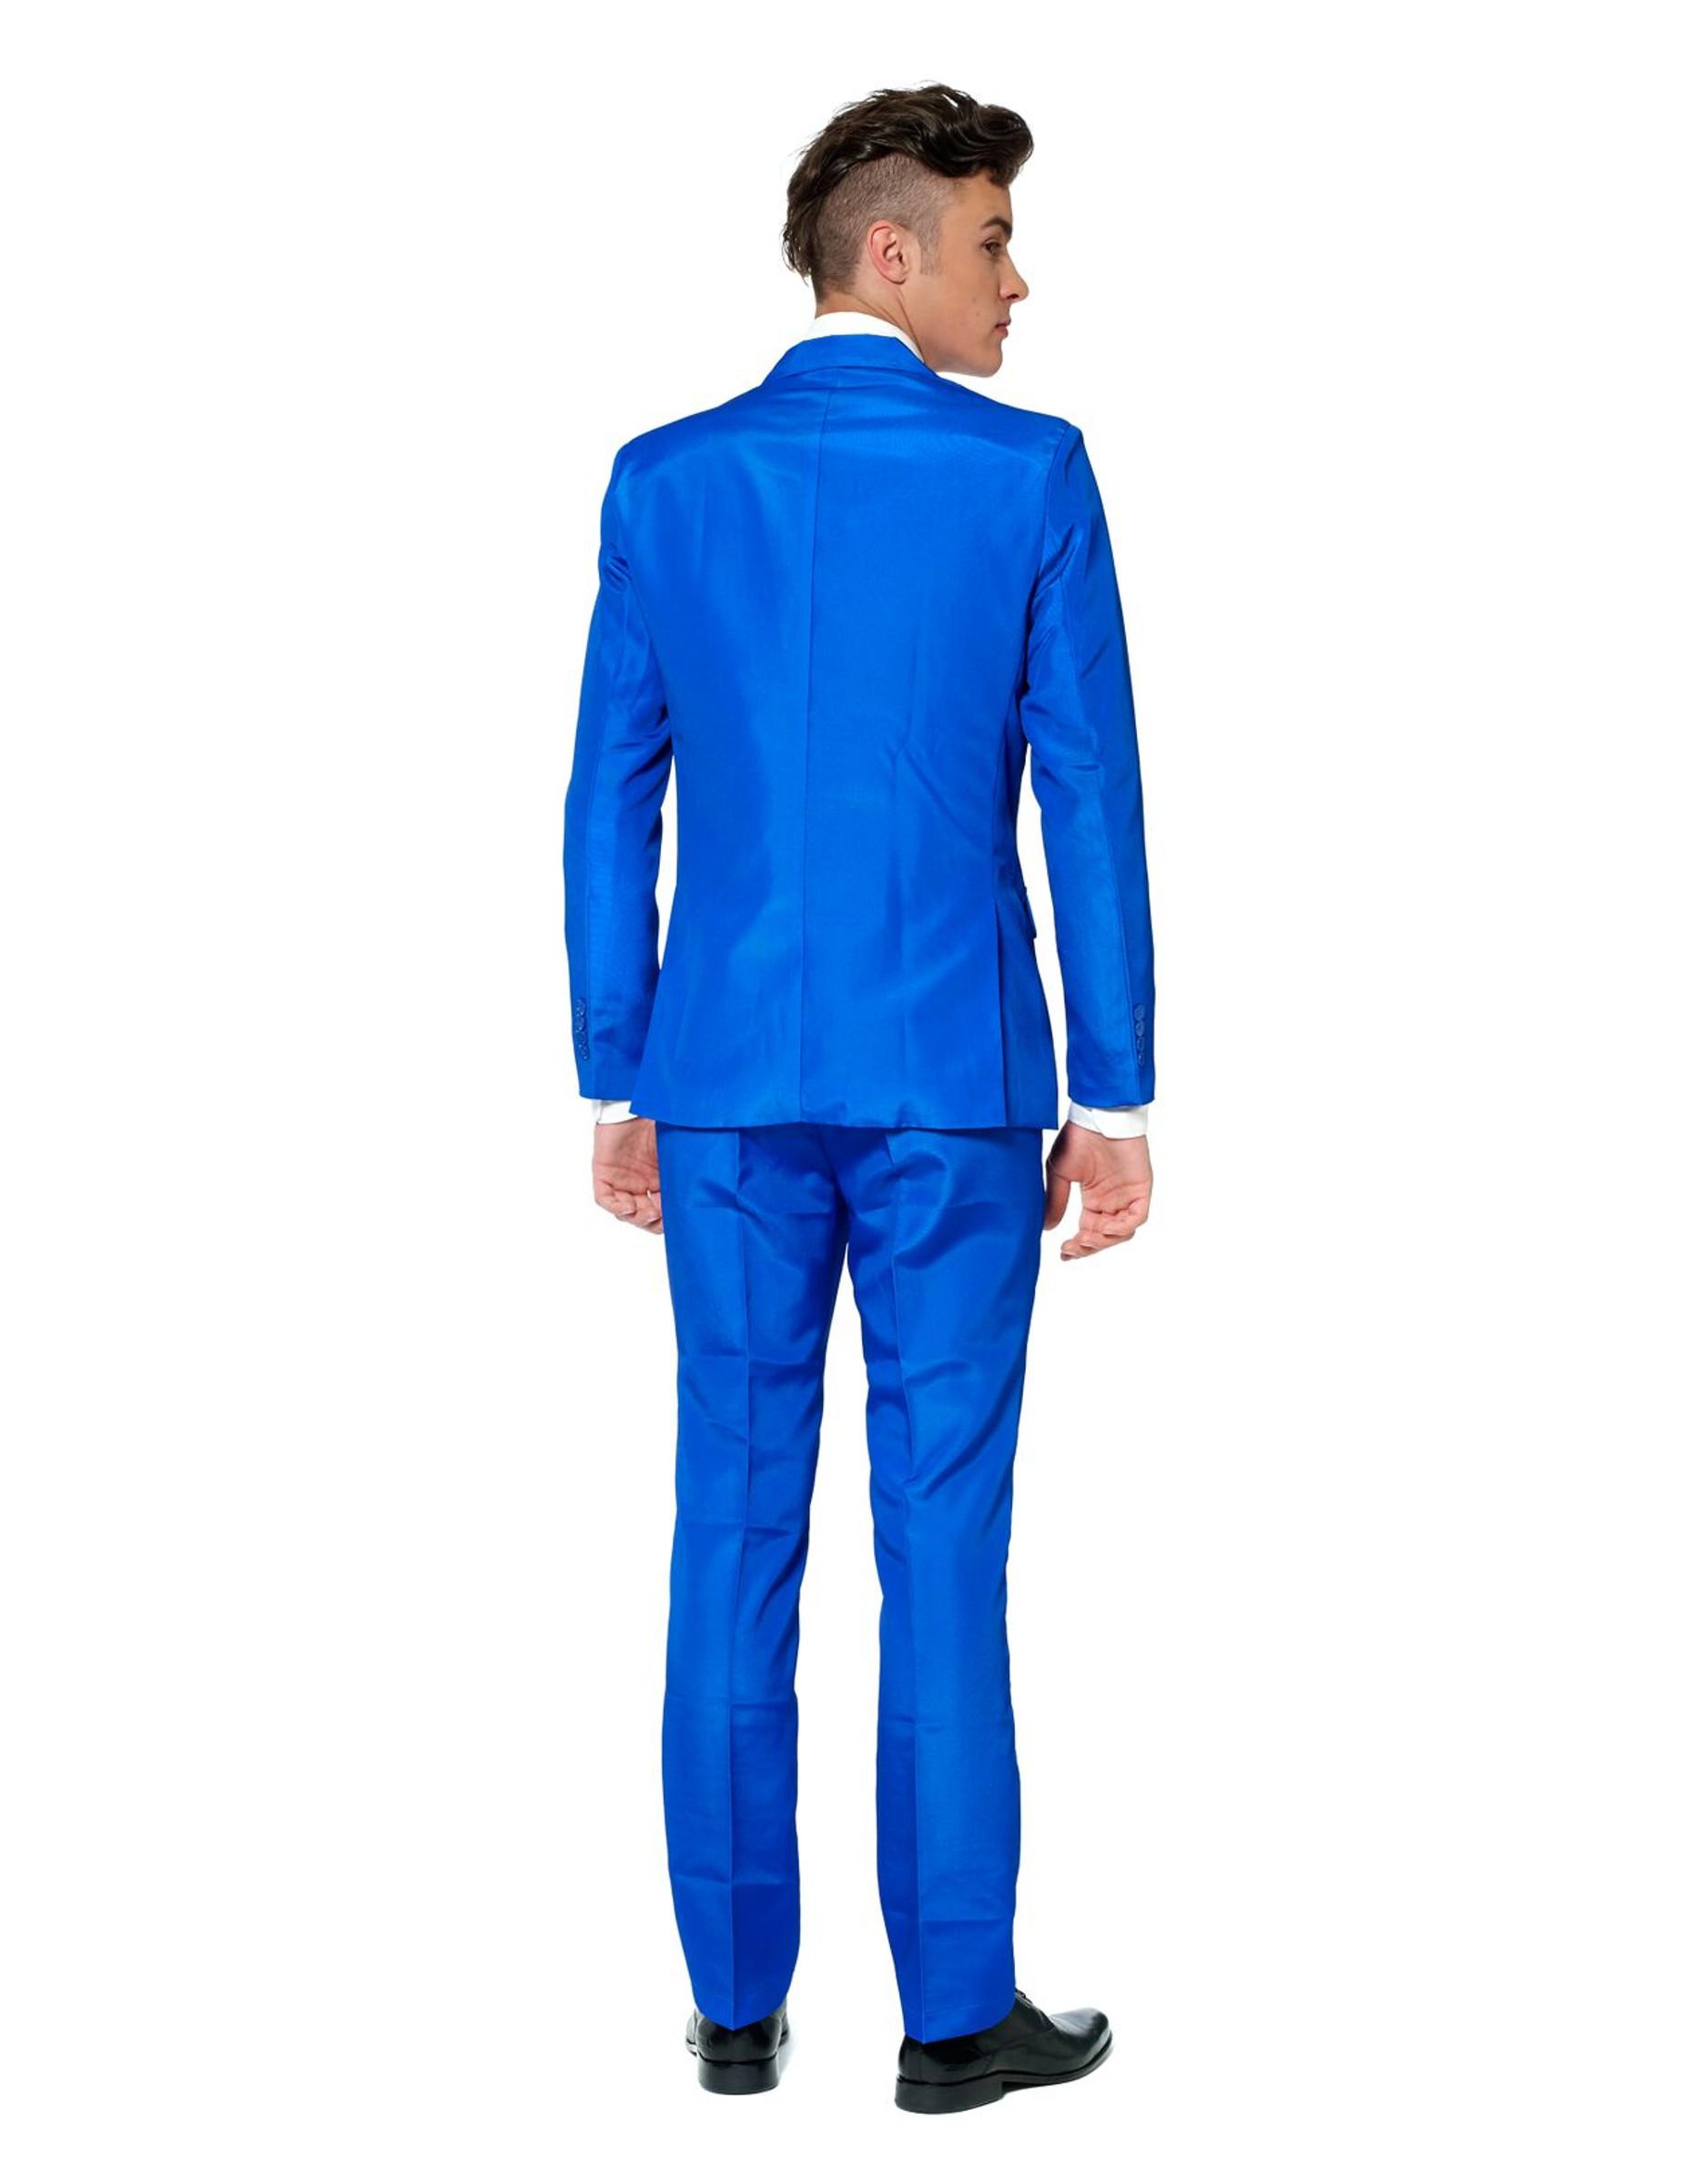 anzug f r herren von suitmeister blau g nstige faschings kost me bei karneval megastore. Black Bedroom Furniture Sets. Home Design Ideas